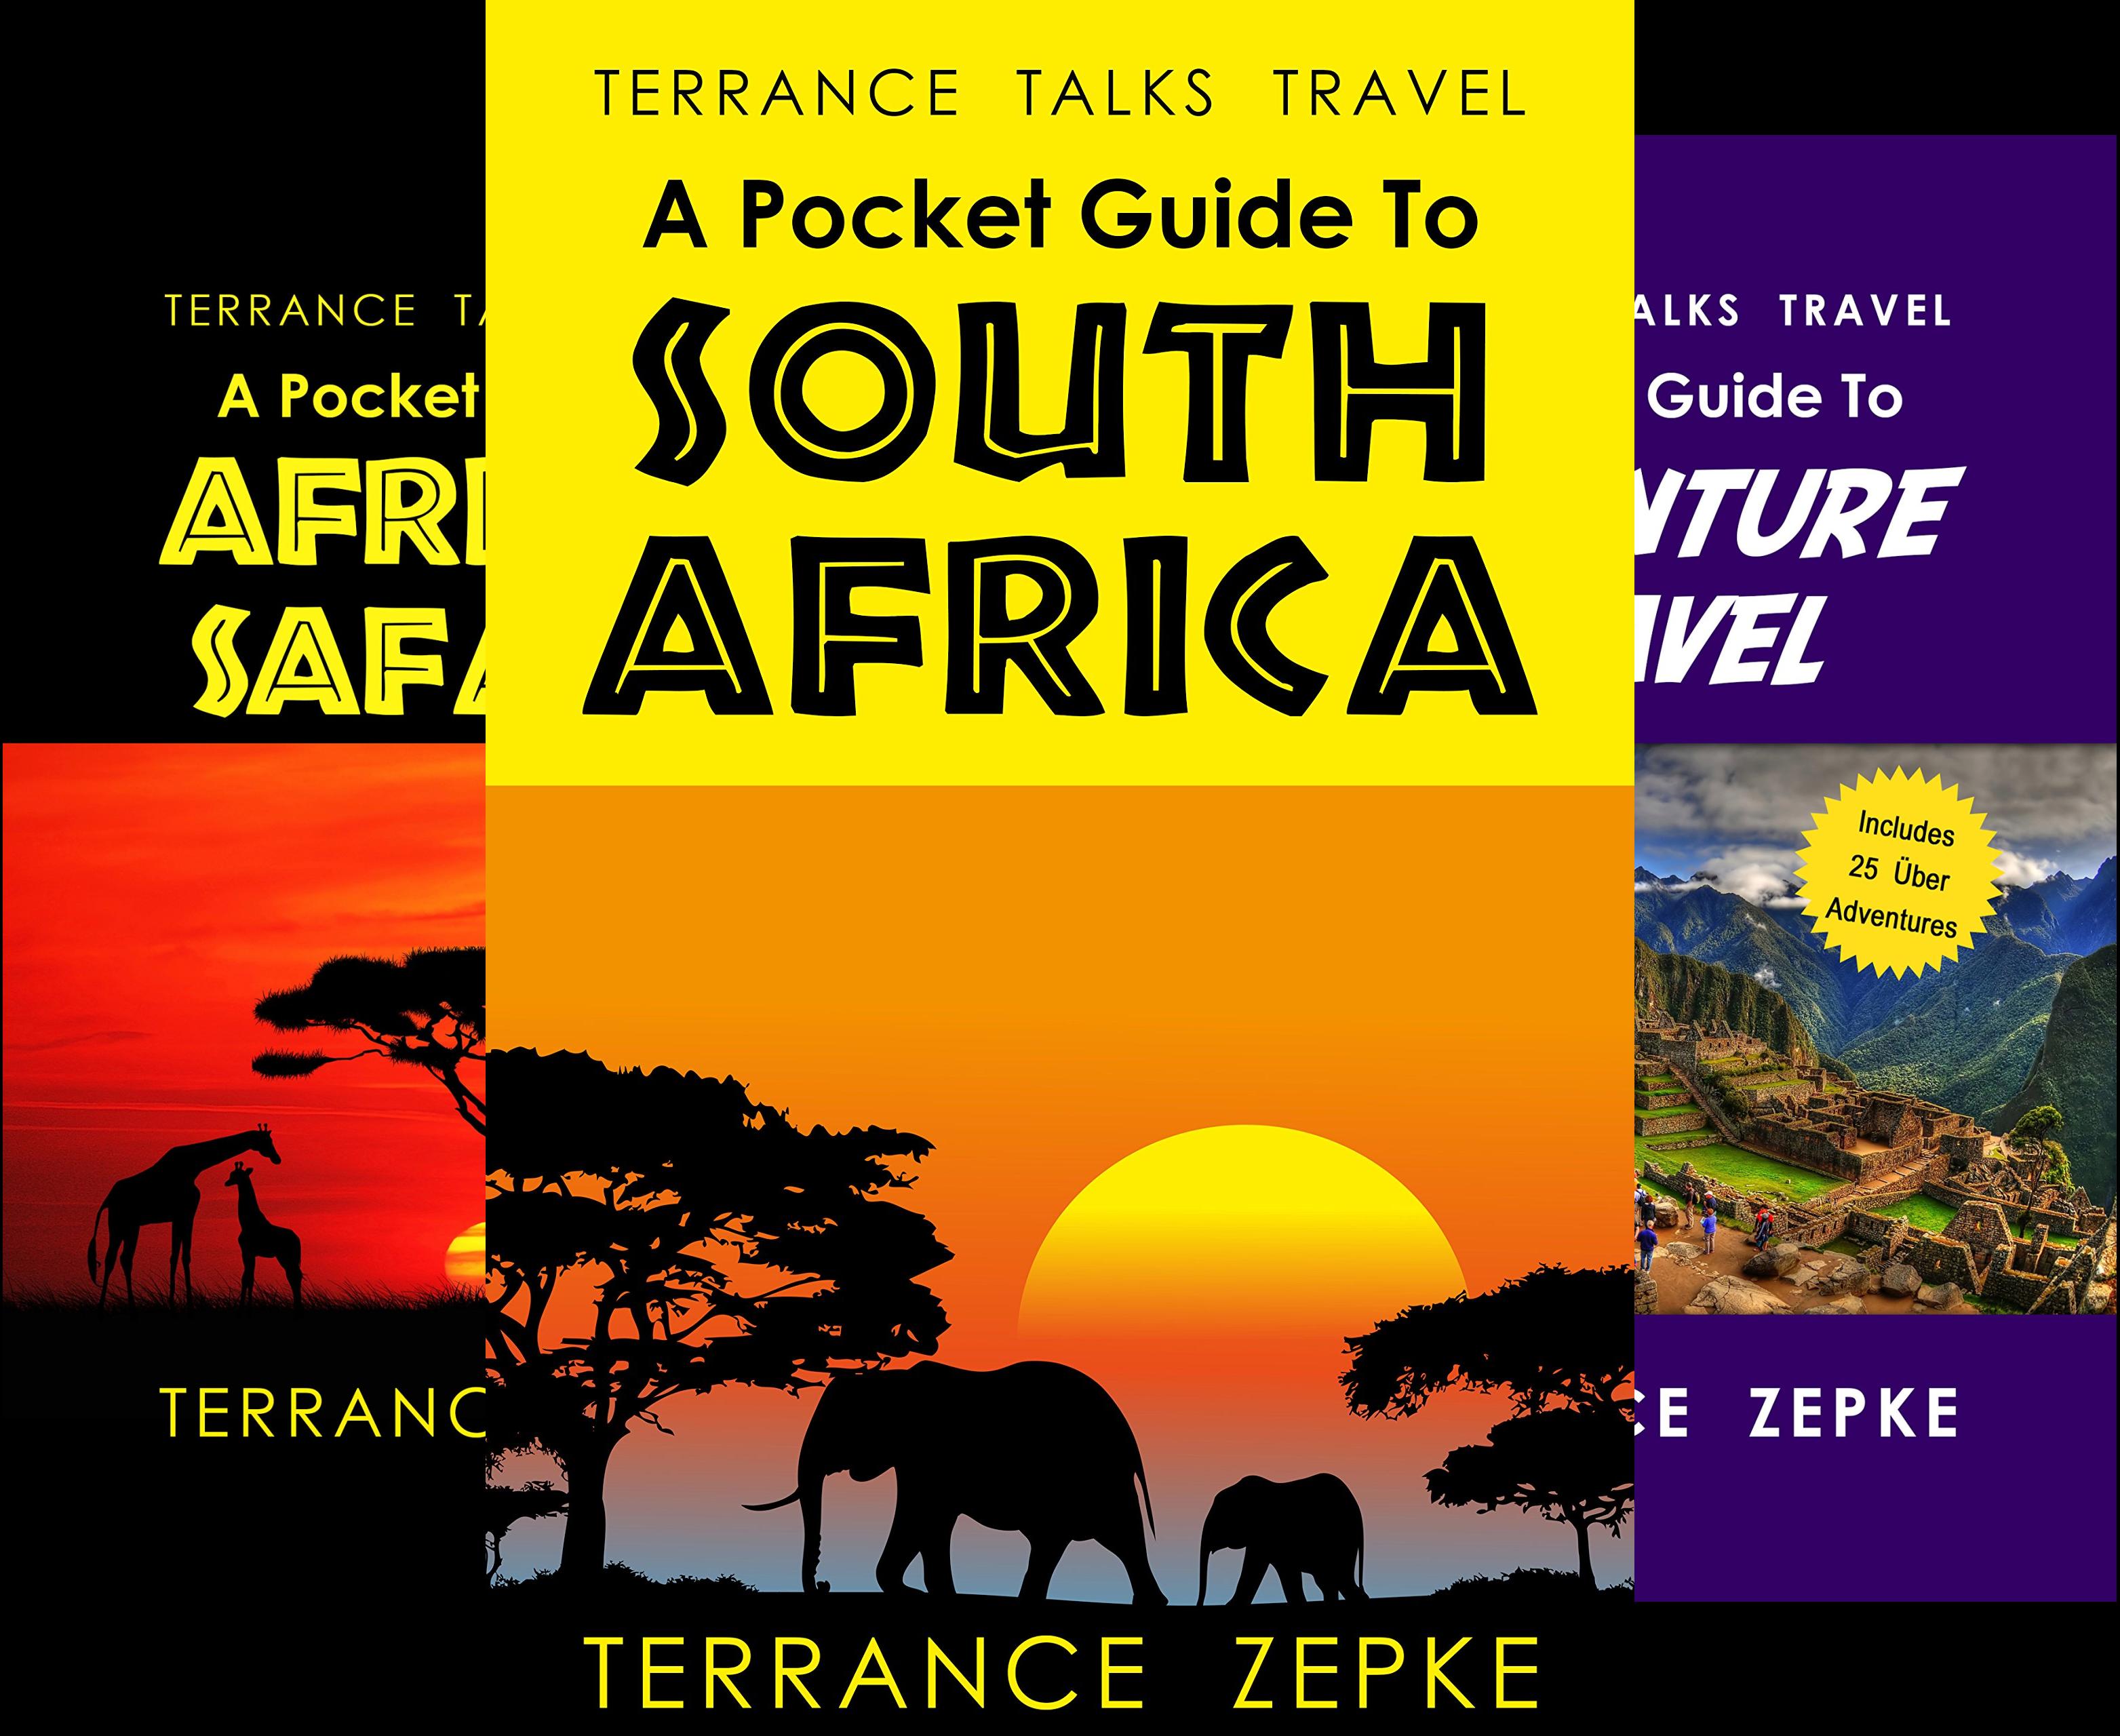 Terrance Talks Travel (7 Book Series)